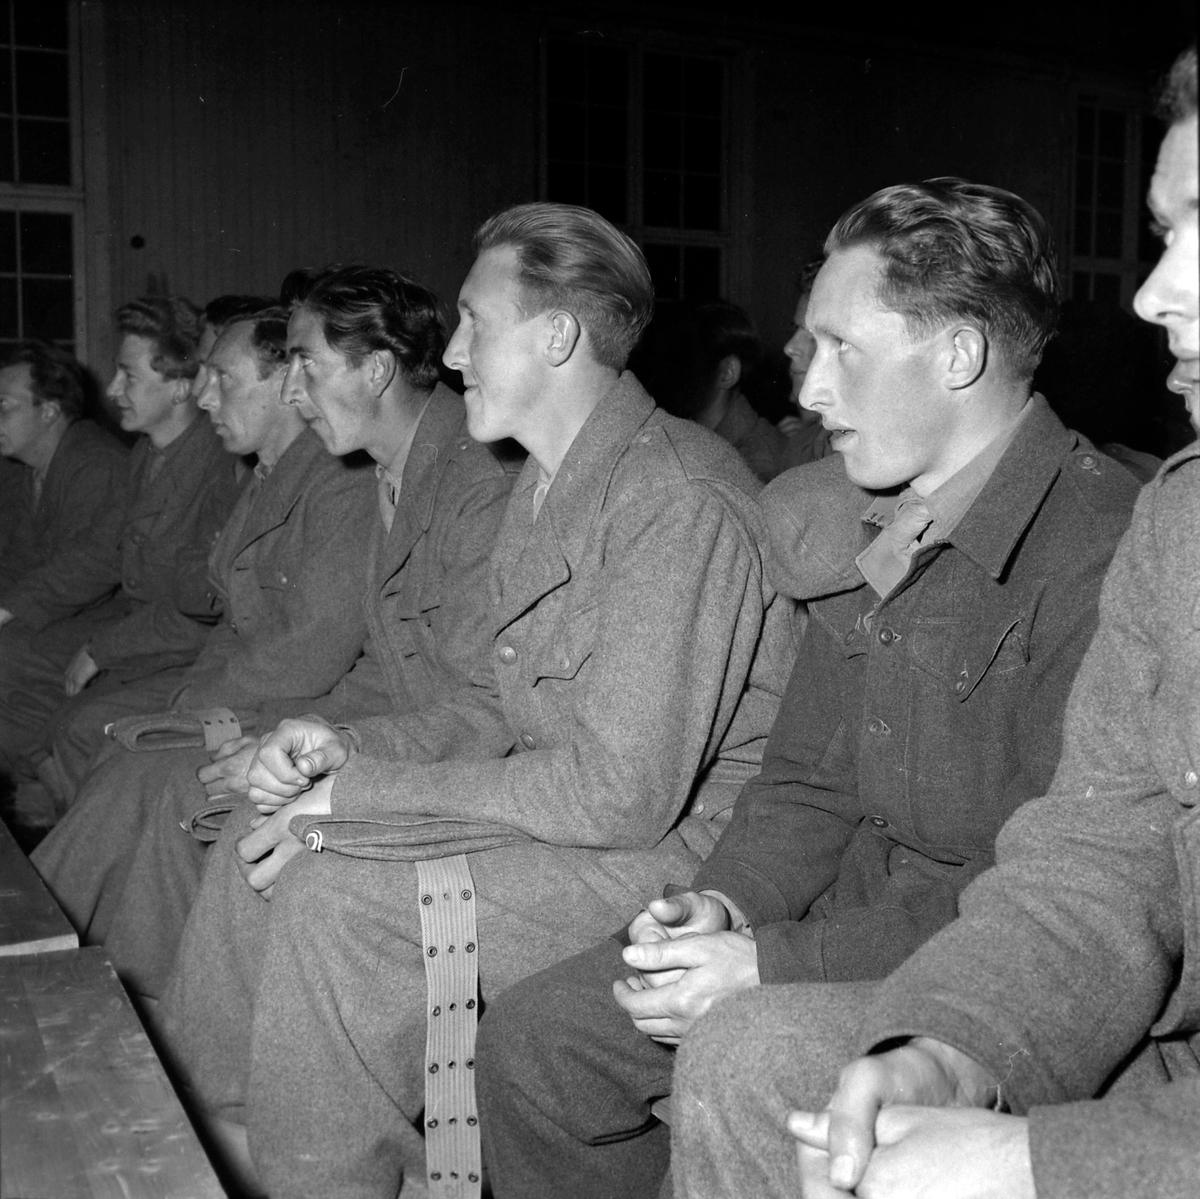 Underholdning for soldater i Øysand leir